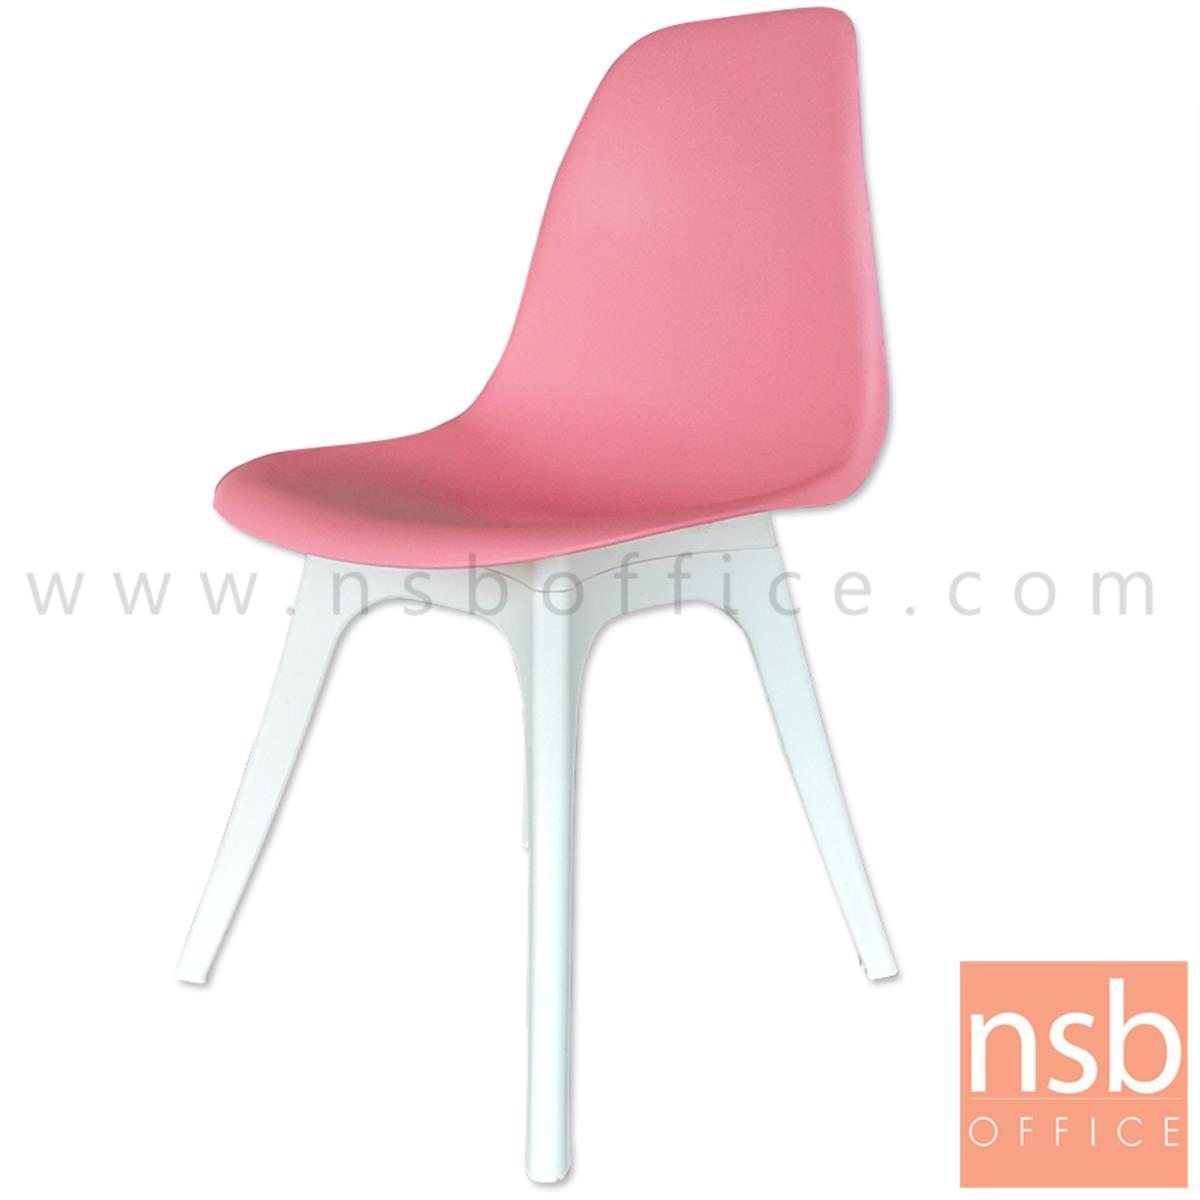 B29A278:เก้าอี้โมเดิร์นพลาสติกสีสัน รุ่น Maceo (มาซิโอ) ขนาด 46.6W cm.